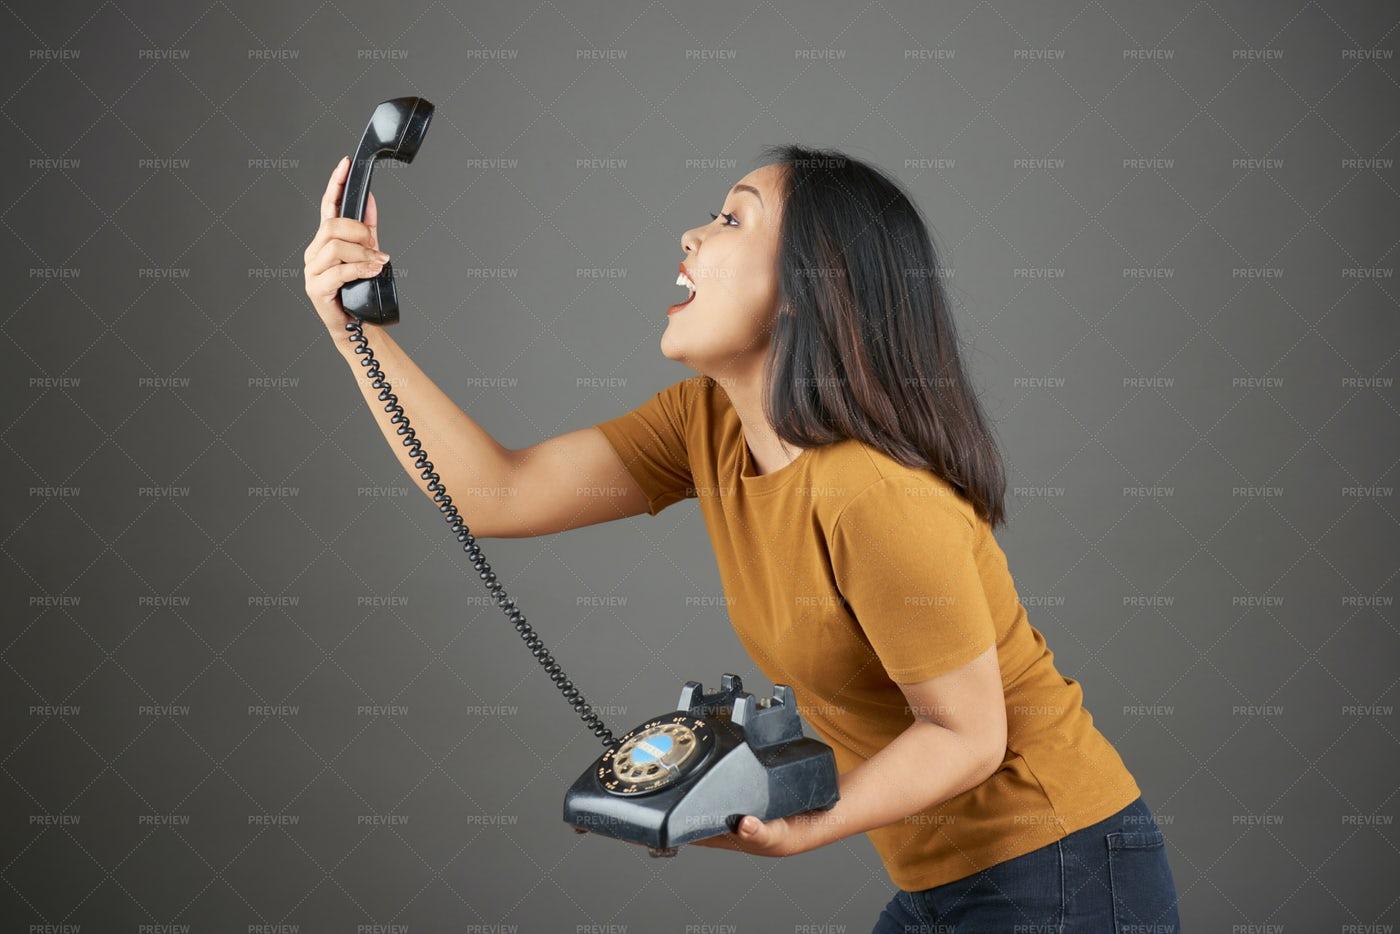 Woman Holding Retro Phone: Stock Photos